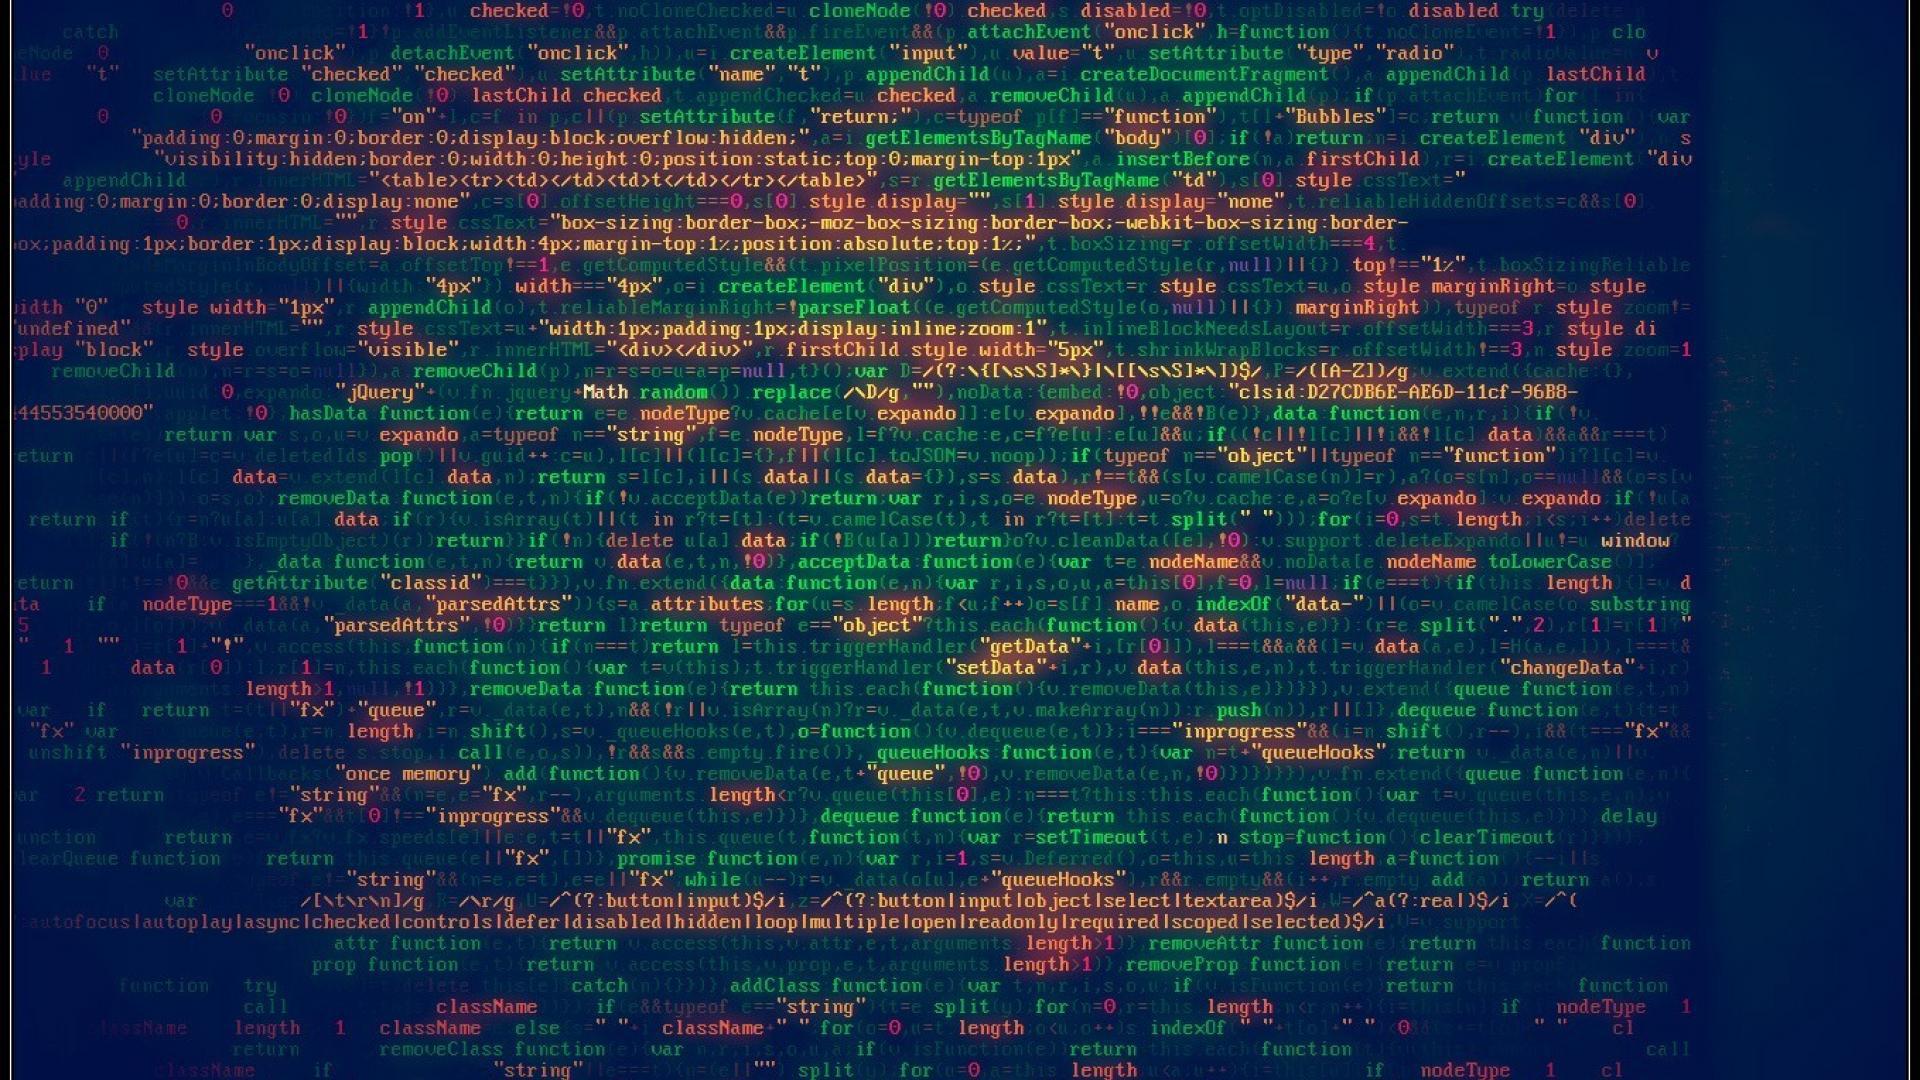 35 JavaScript Code Wallpapers   Download at WallpaperBro 1920x1080